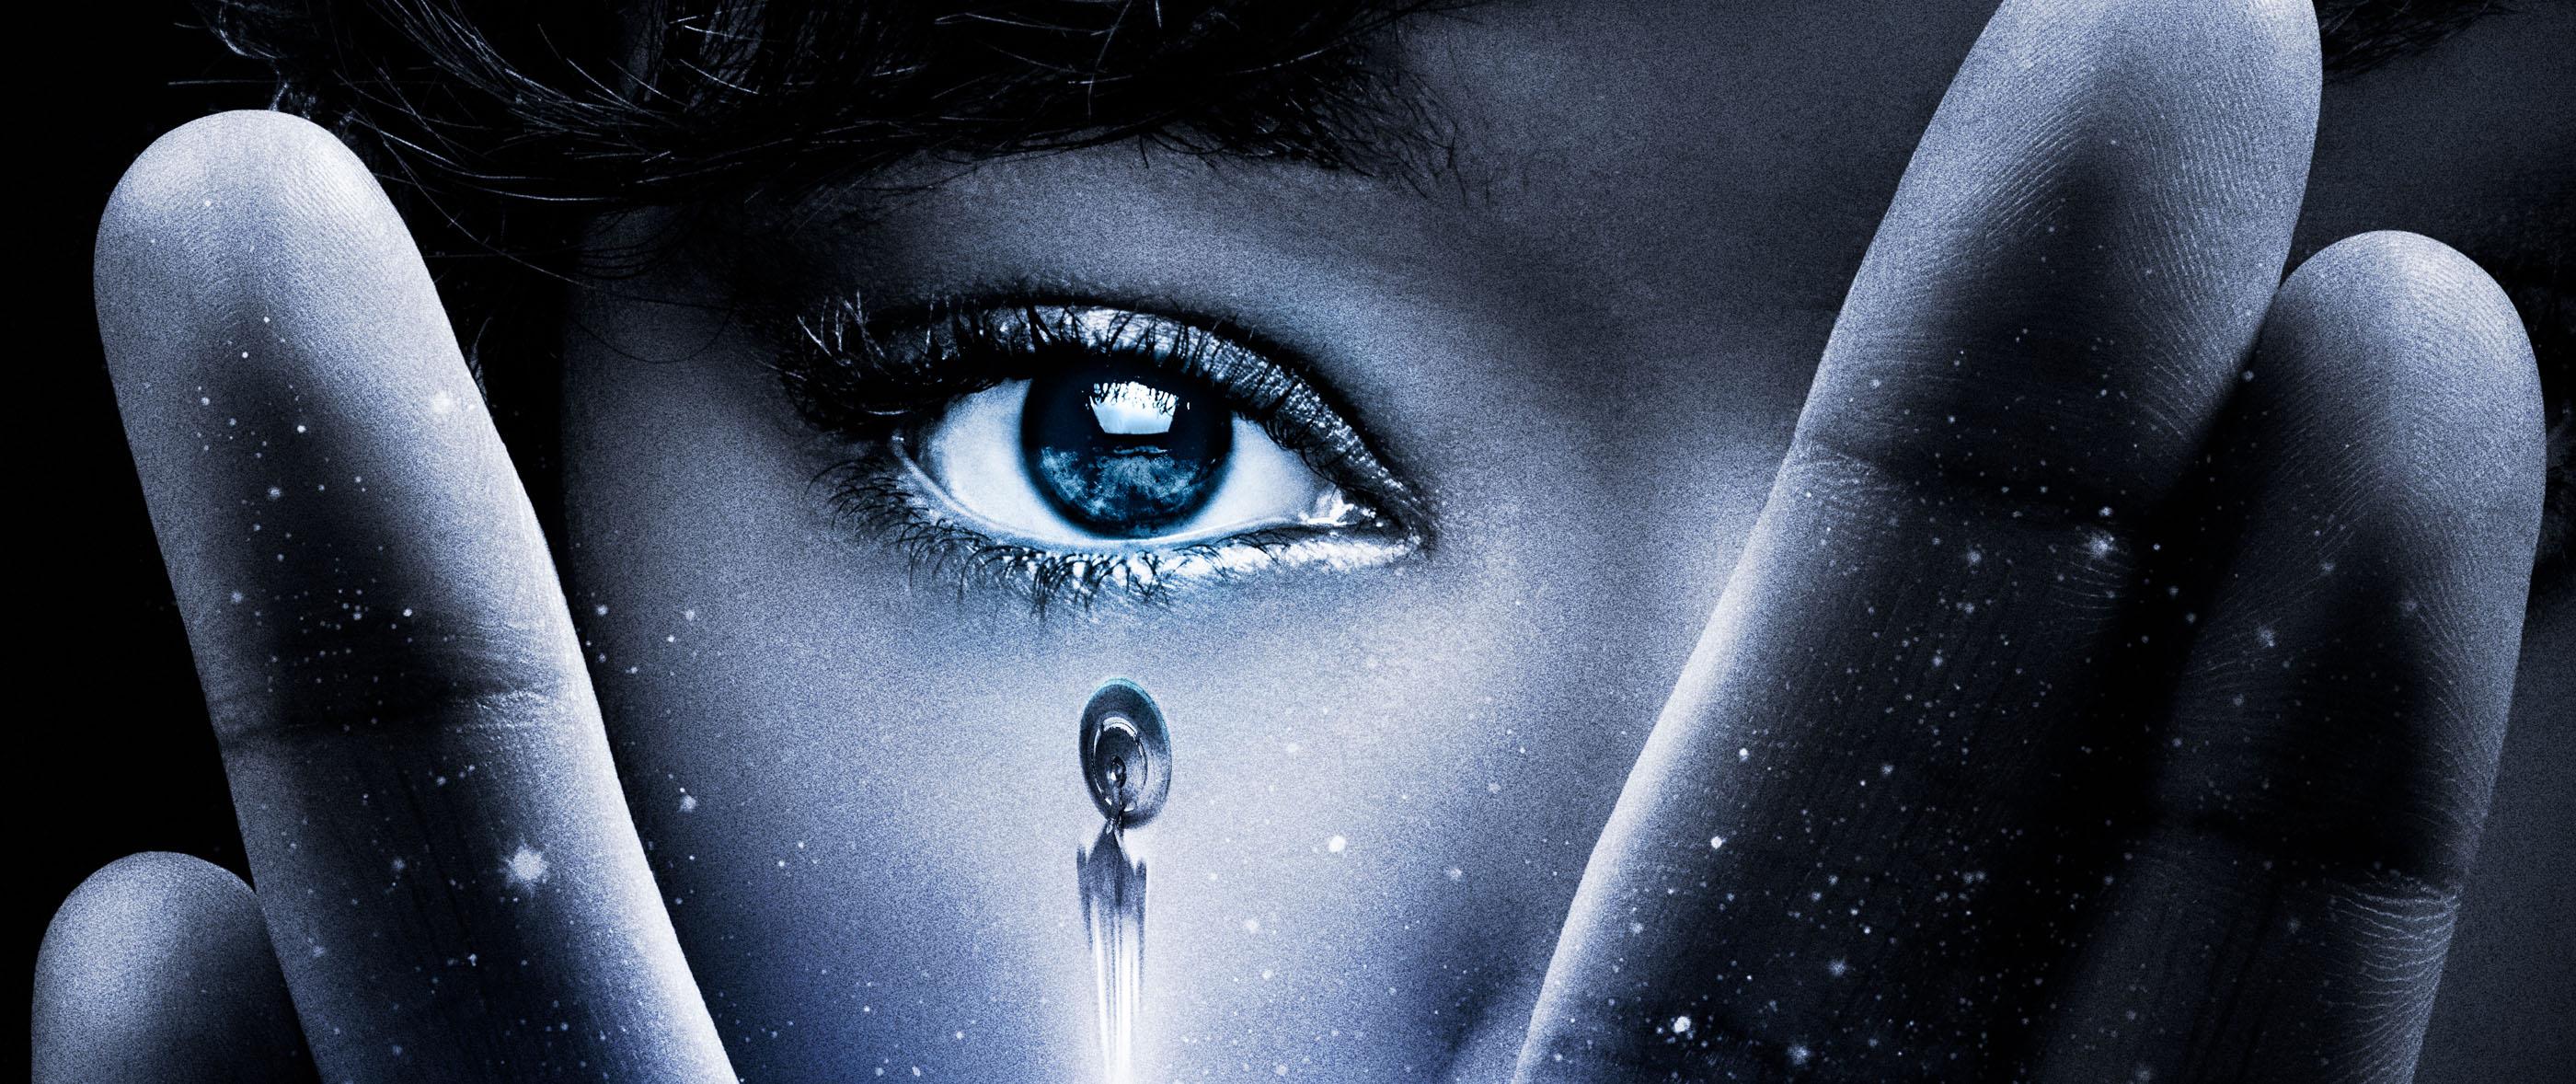 Wallpaper Star Trek Star Trek Discovery Science Fiction